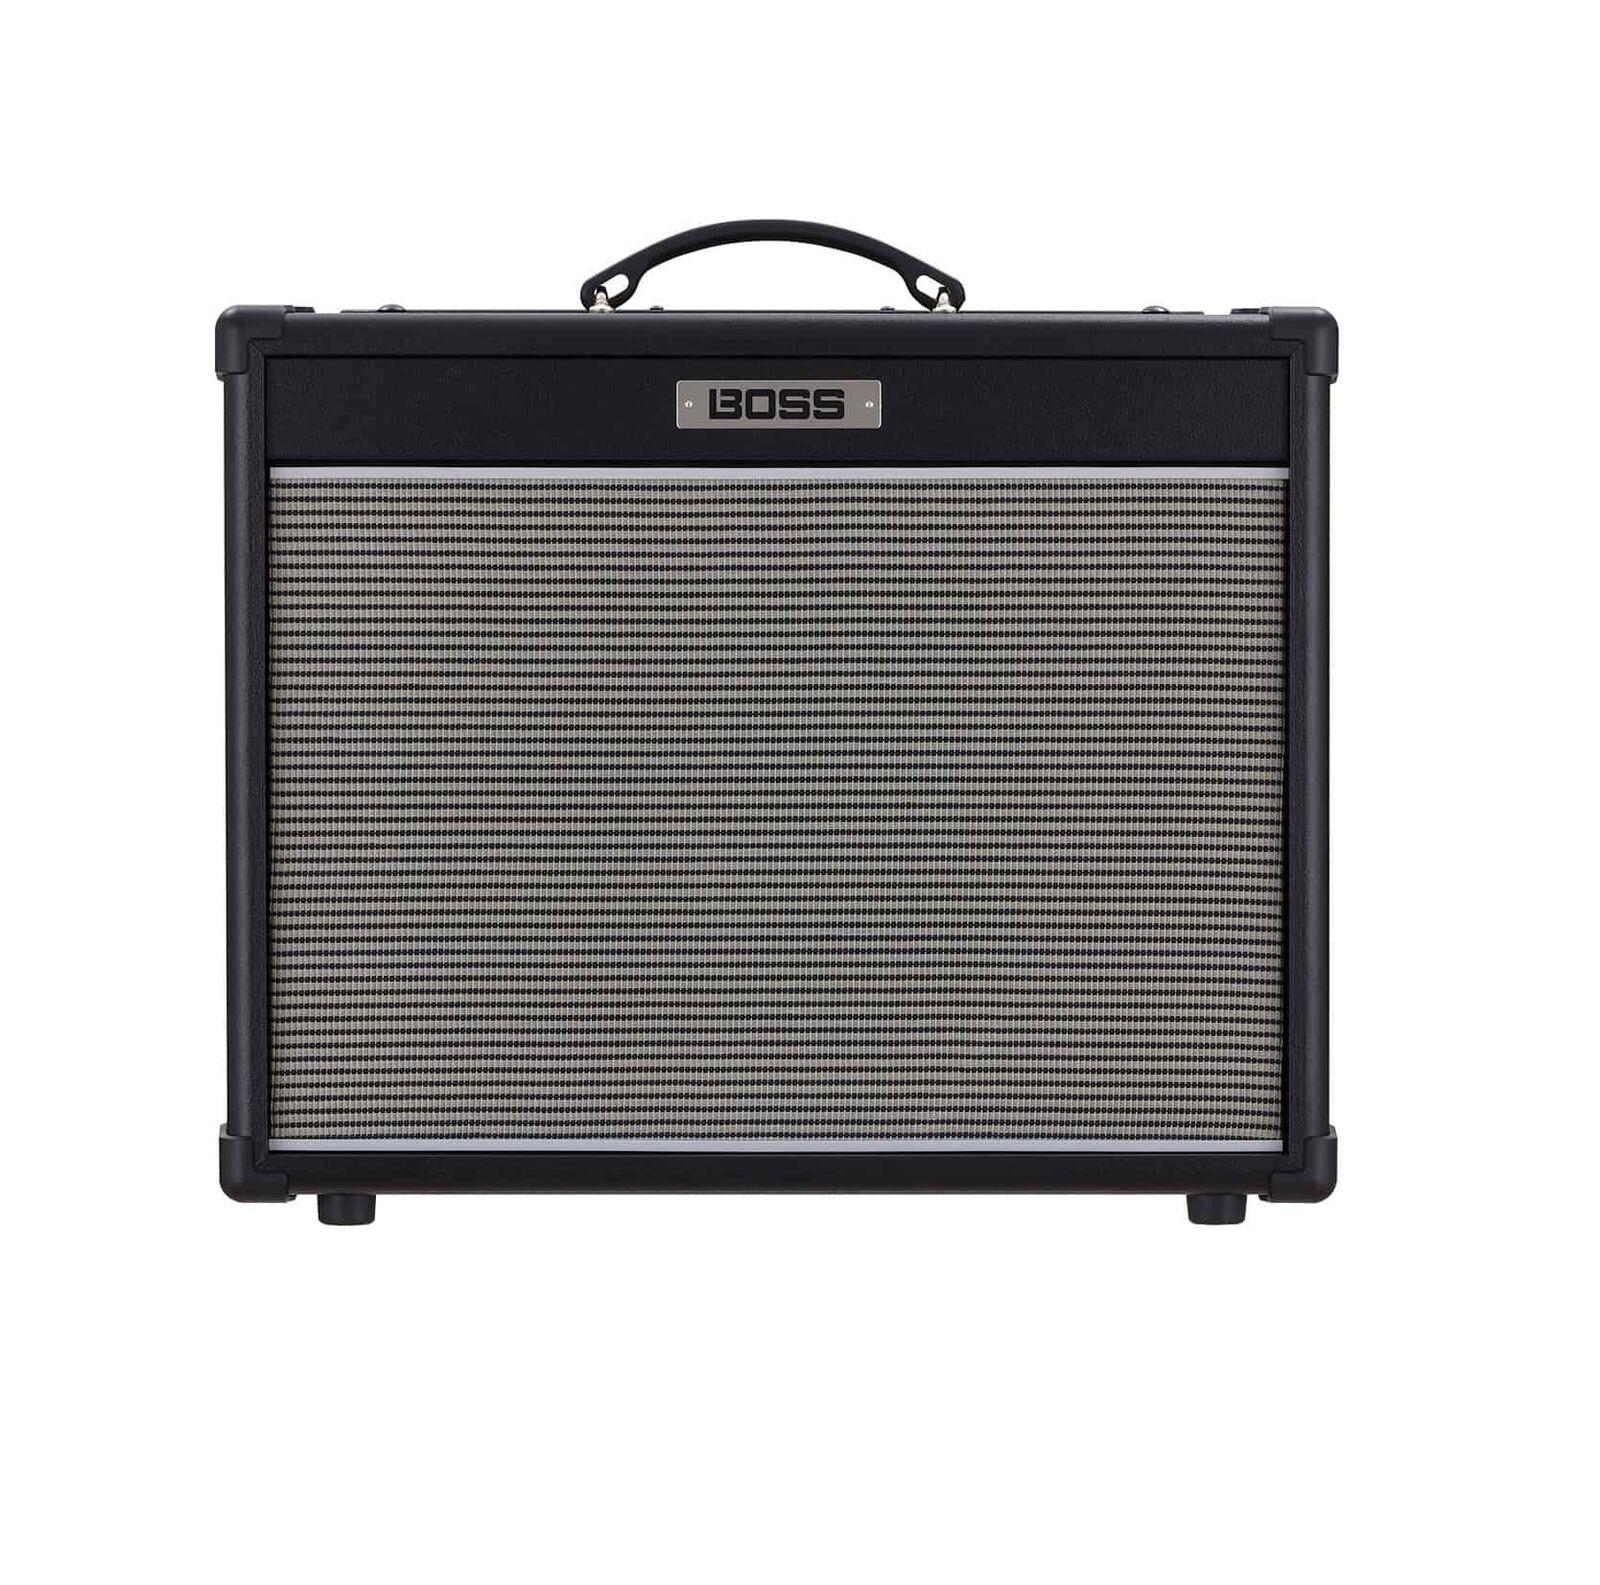 Boss Nextone Stage 40W Guitar Amplifier